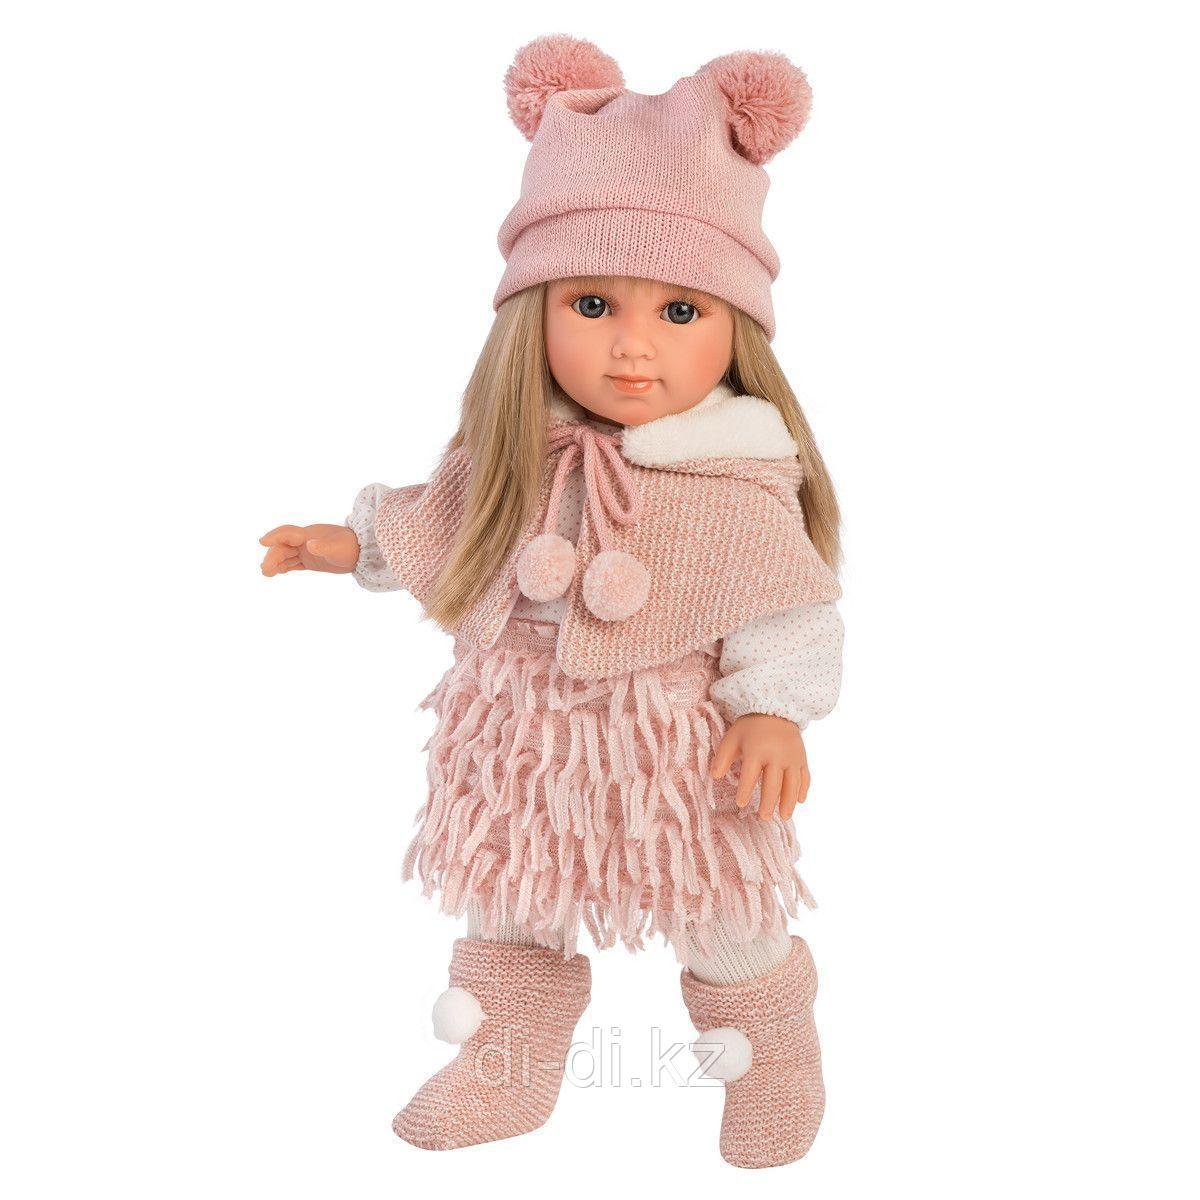 LLORENS Кукла Елена 35 см, блондинка в розовом костюме и шапке с двумя помпонами